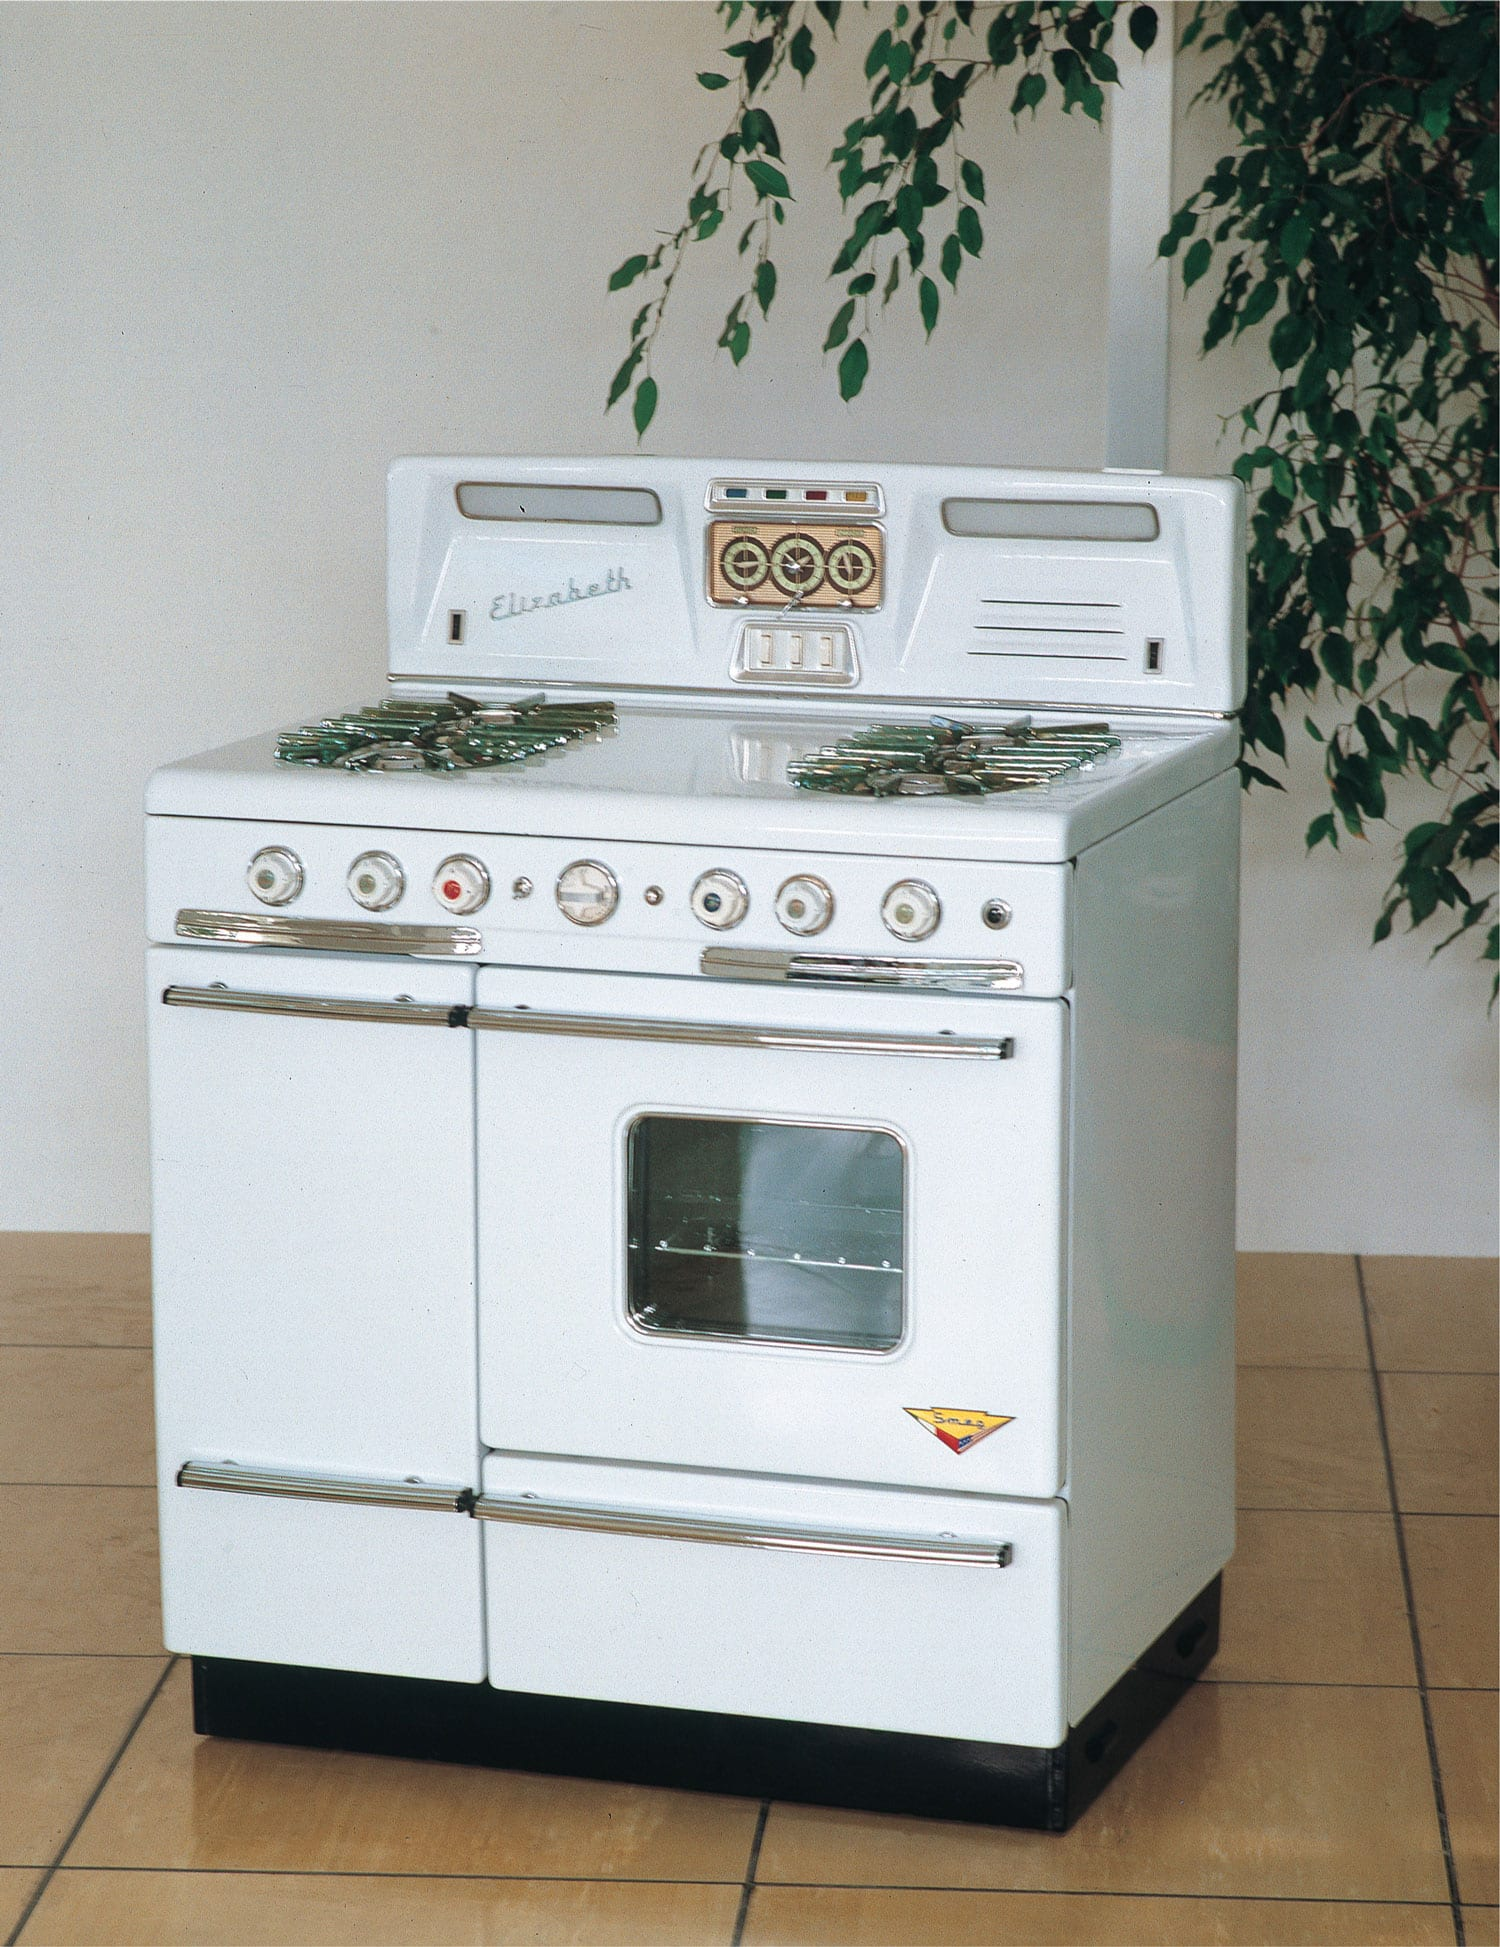 Smeg 1956 Flame Failure Cooker Elizabeth   Yellowtrace